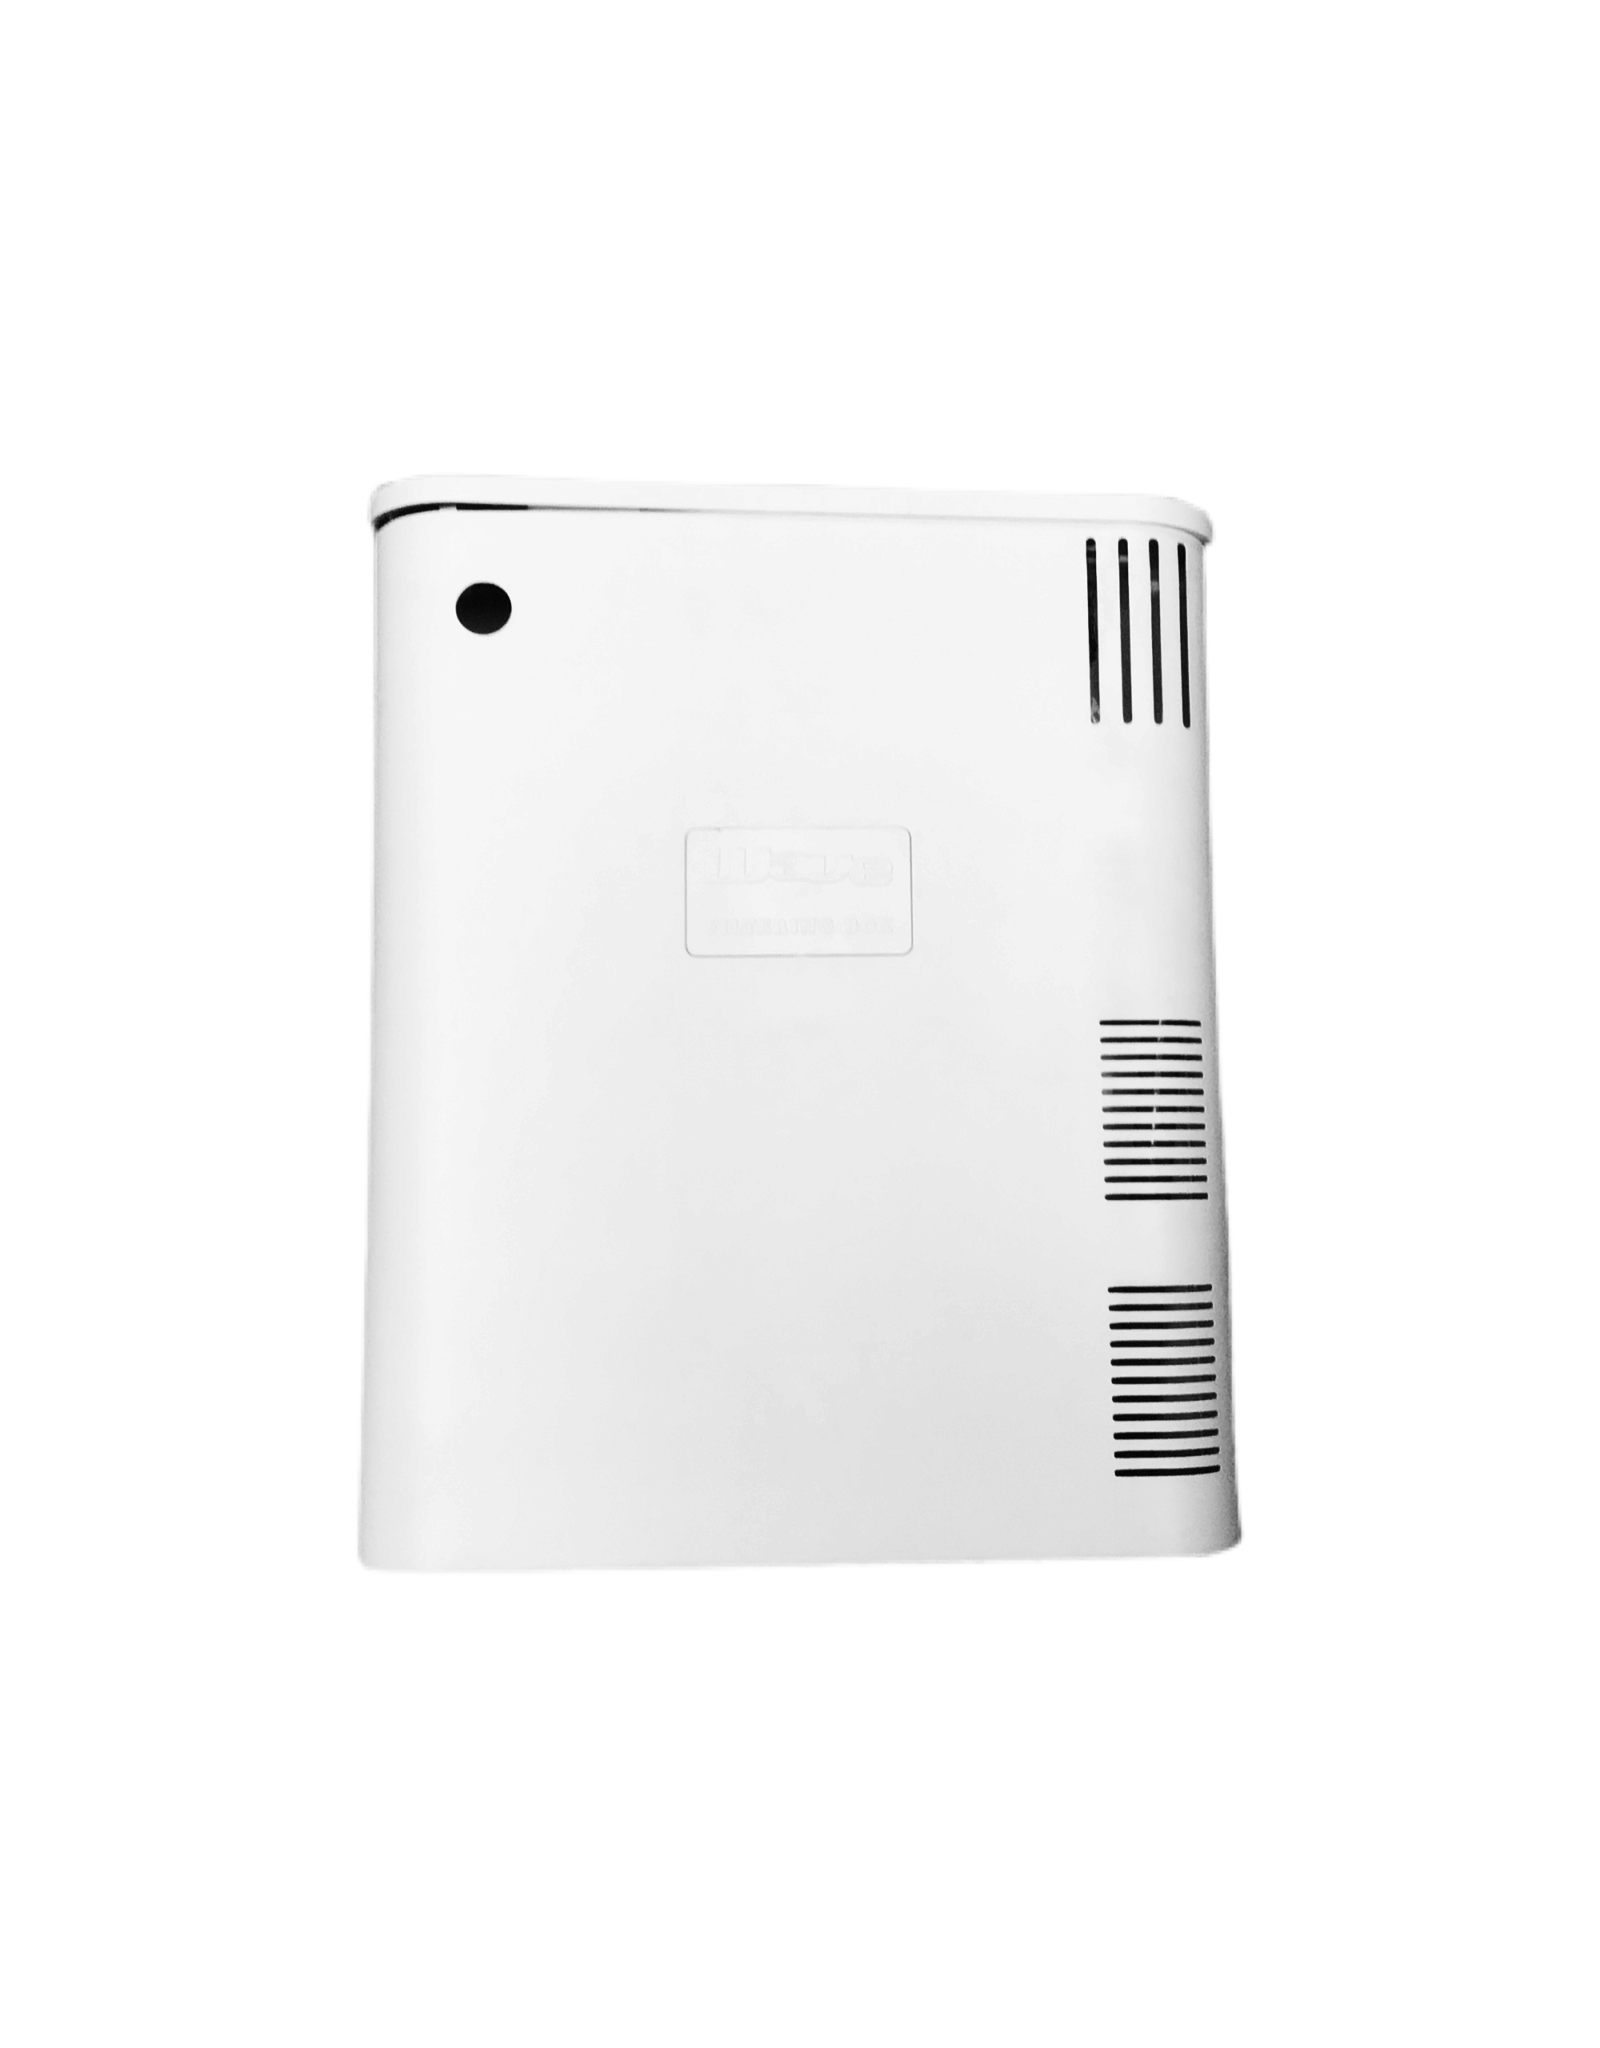 Wave/Amtra Black box 100 - Wit biologisch filter